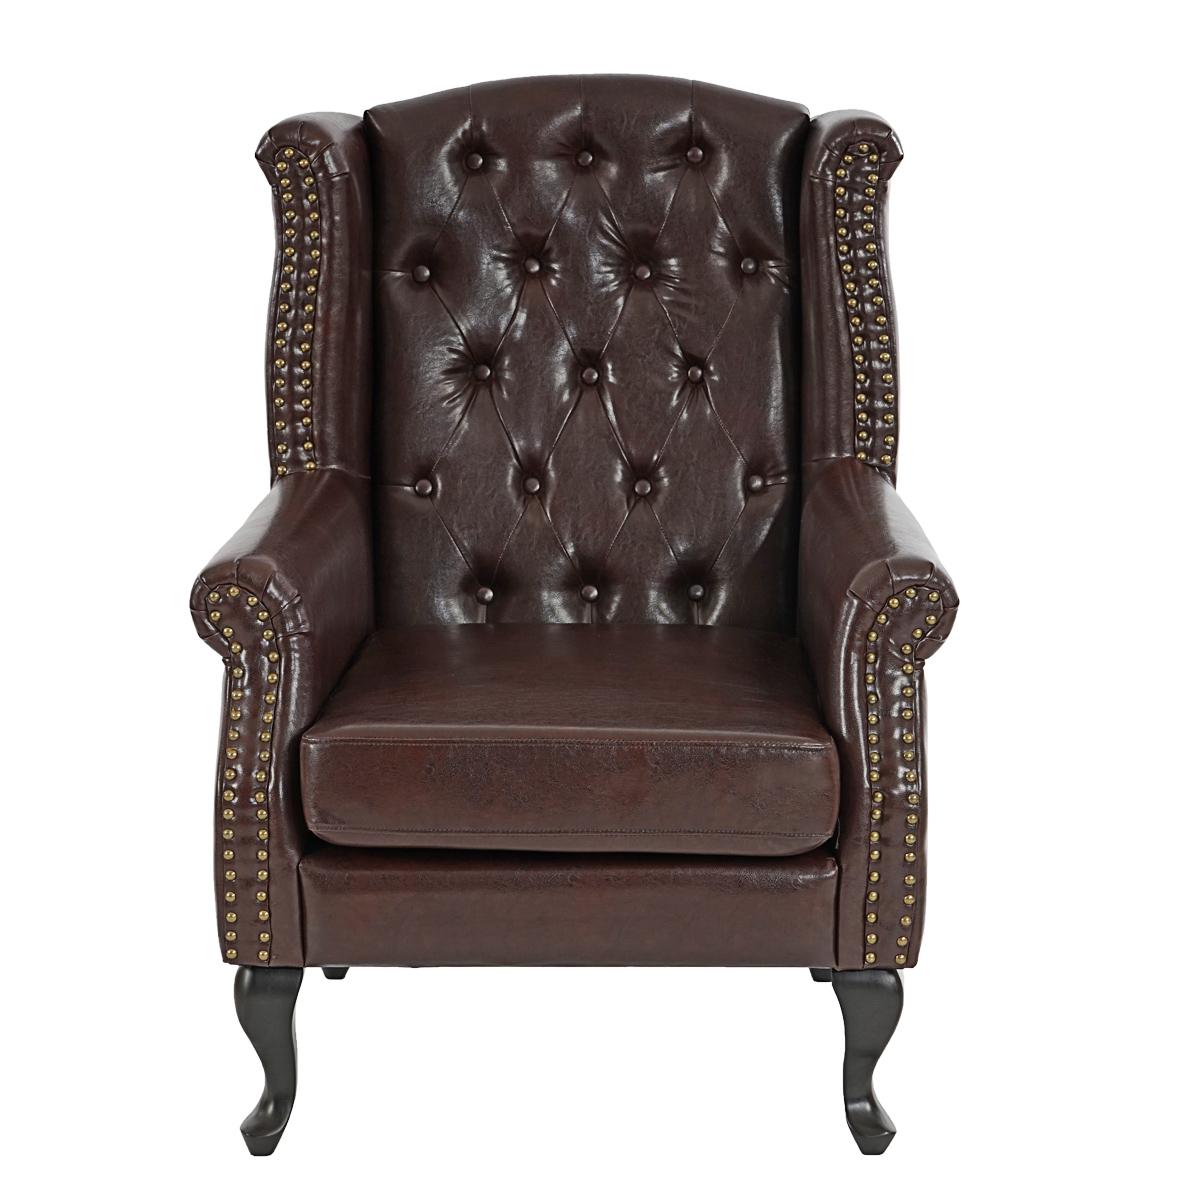 sessel relaxsessel clubsessel ohrensessel chesterfield kunstleder antik braun ohne ottomane. Black Bedroom Furniture Sets. Home Design Ideas